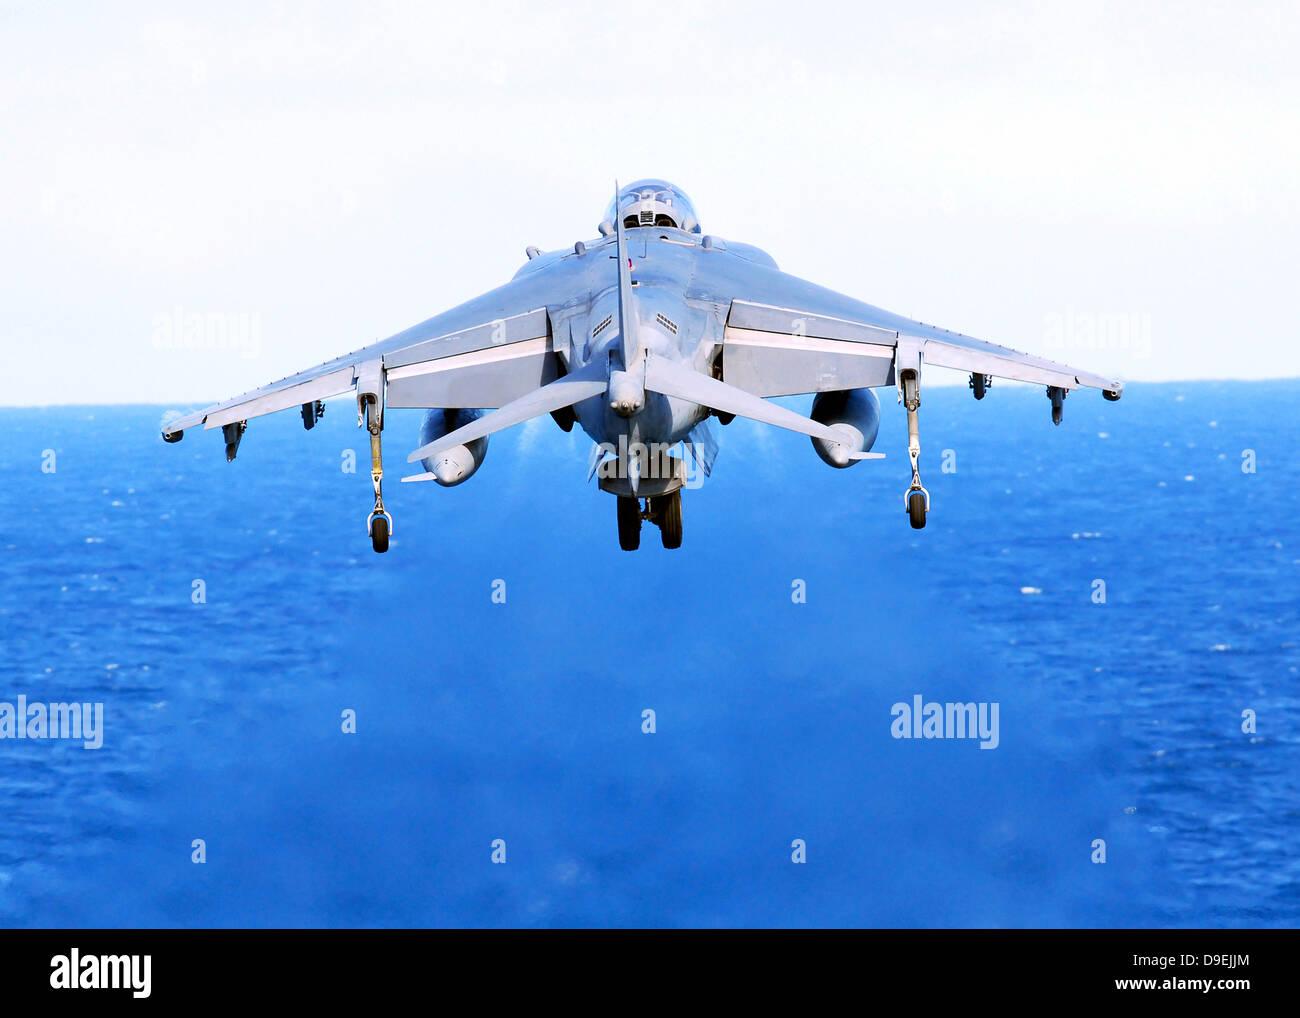 An AV-8B Harrier jet launches off the flight deck of USS Peleliu. Stock Photo